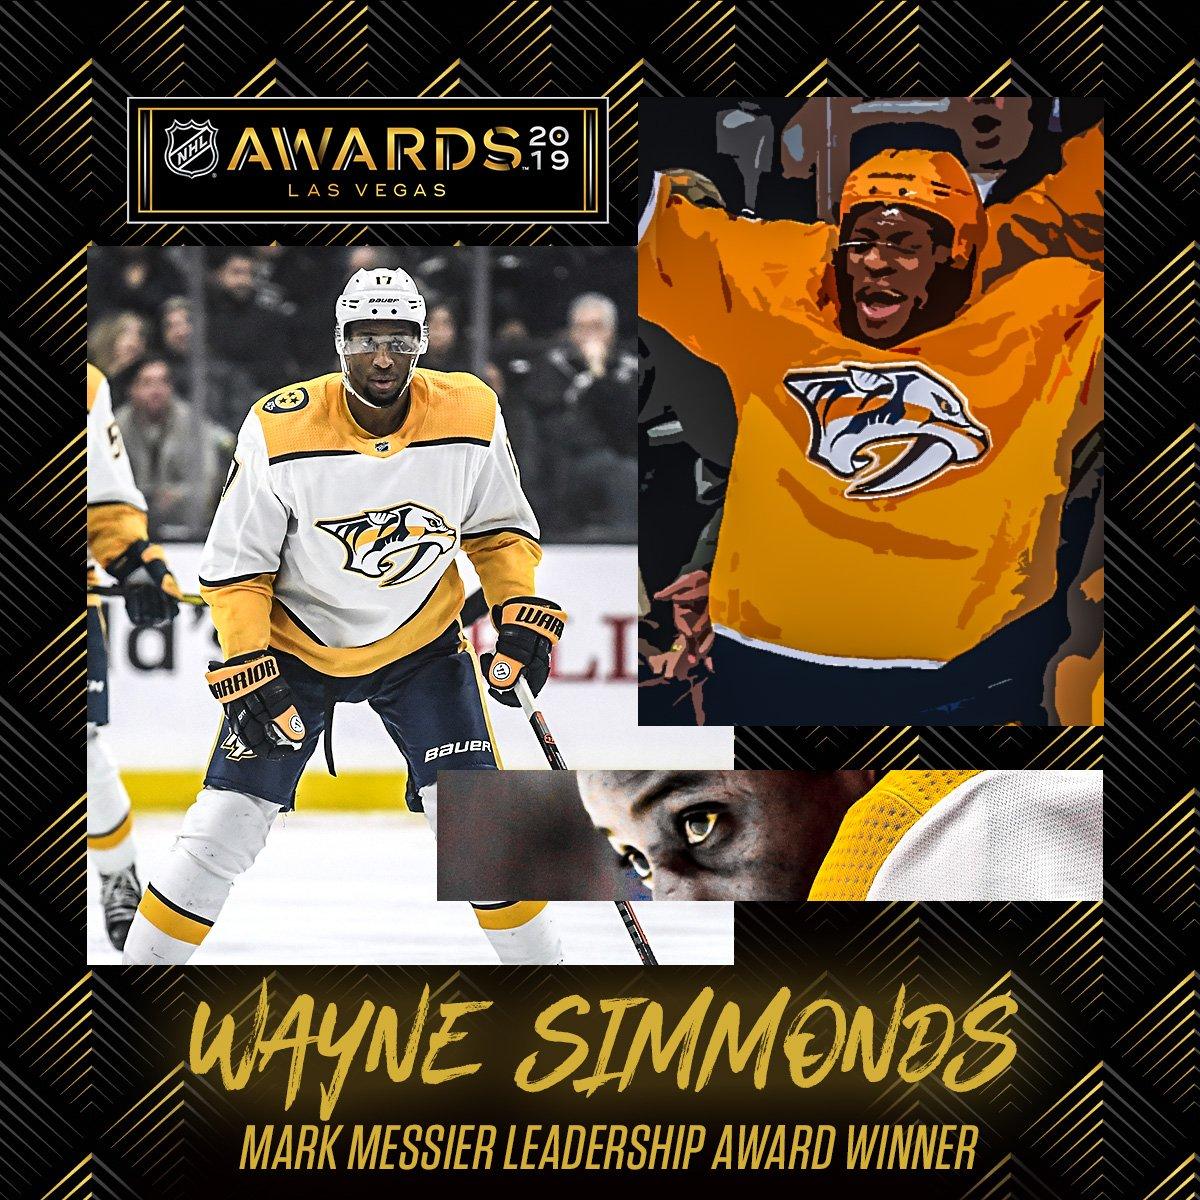 All aboard the Wayne Train!   Your 2019 Mark Messier Leadership Award Winner: @Simmonds17.<br>http://pic.twitter.com/fLnSBqufu9